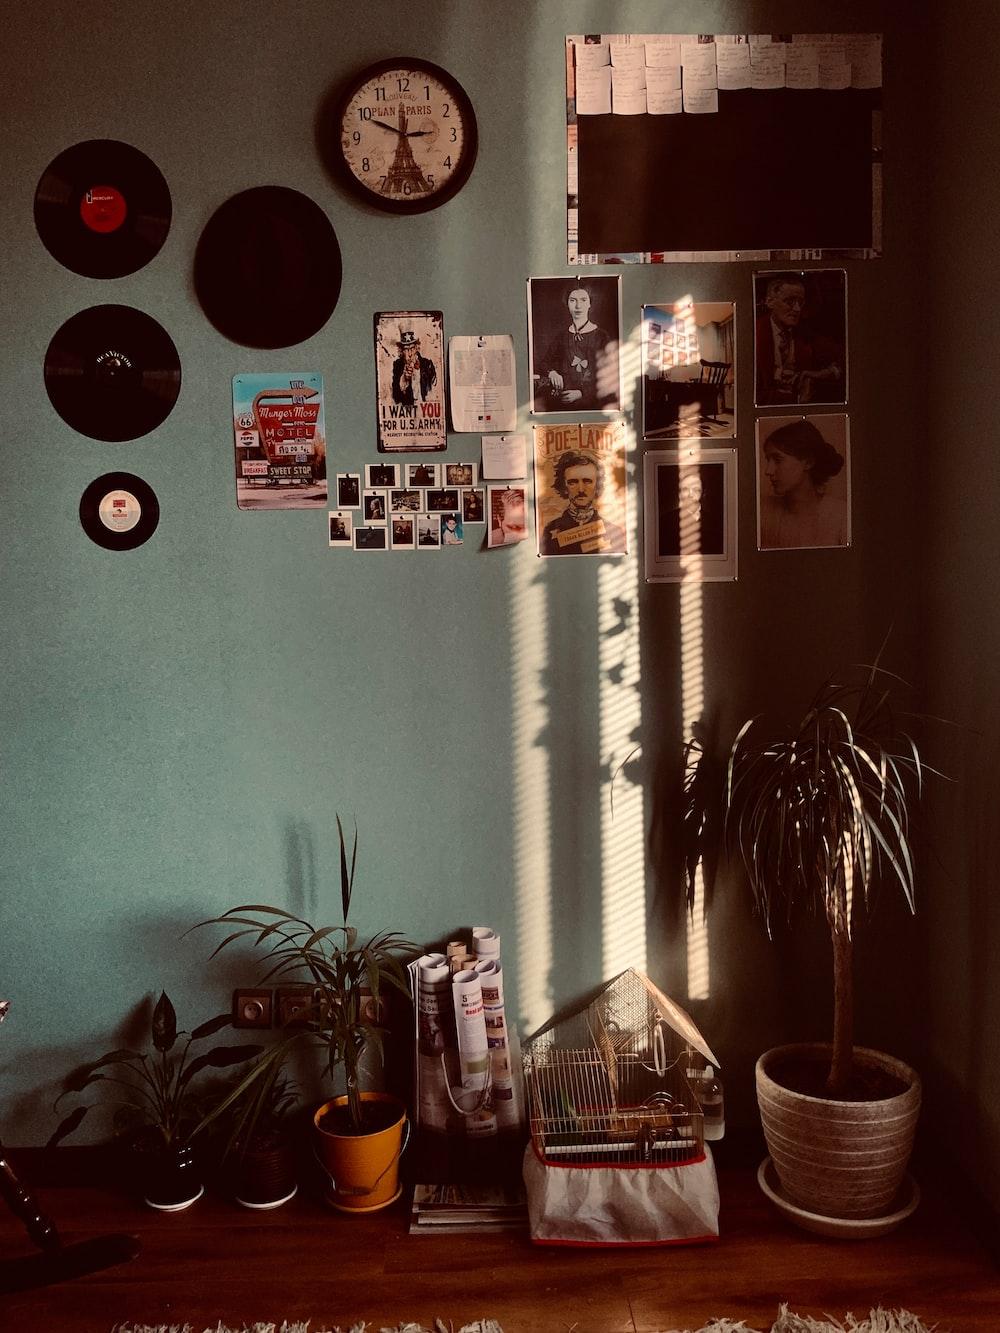 Large Wall Clocks For Living Room: Basic Ideas